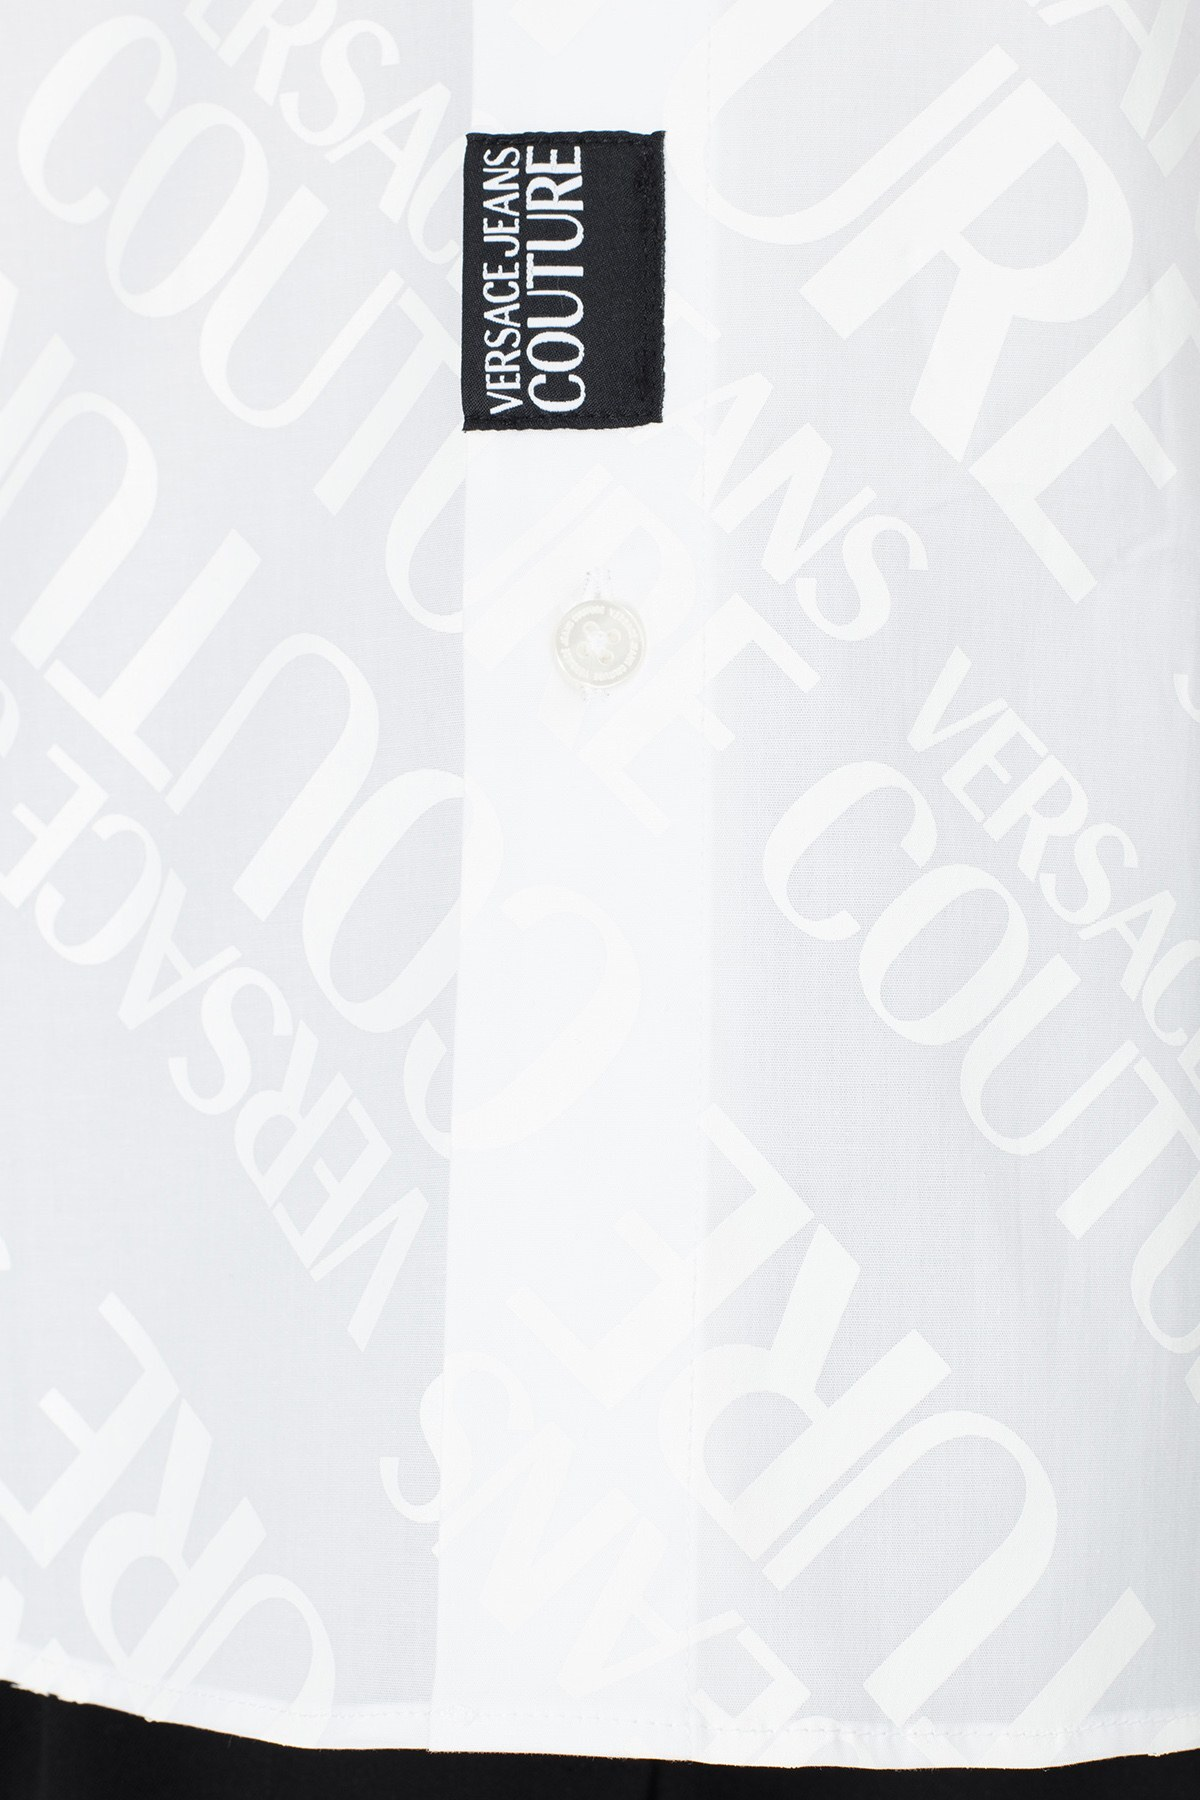 Versace Jeans Couture Slim Fit Erkek Gömlek B1GVB6S1 30205 003 BEYAZ